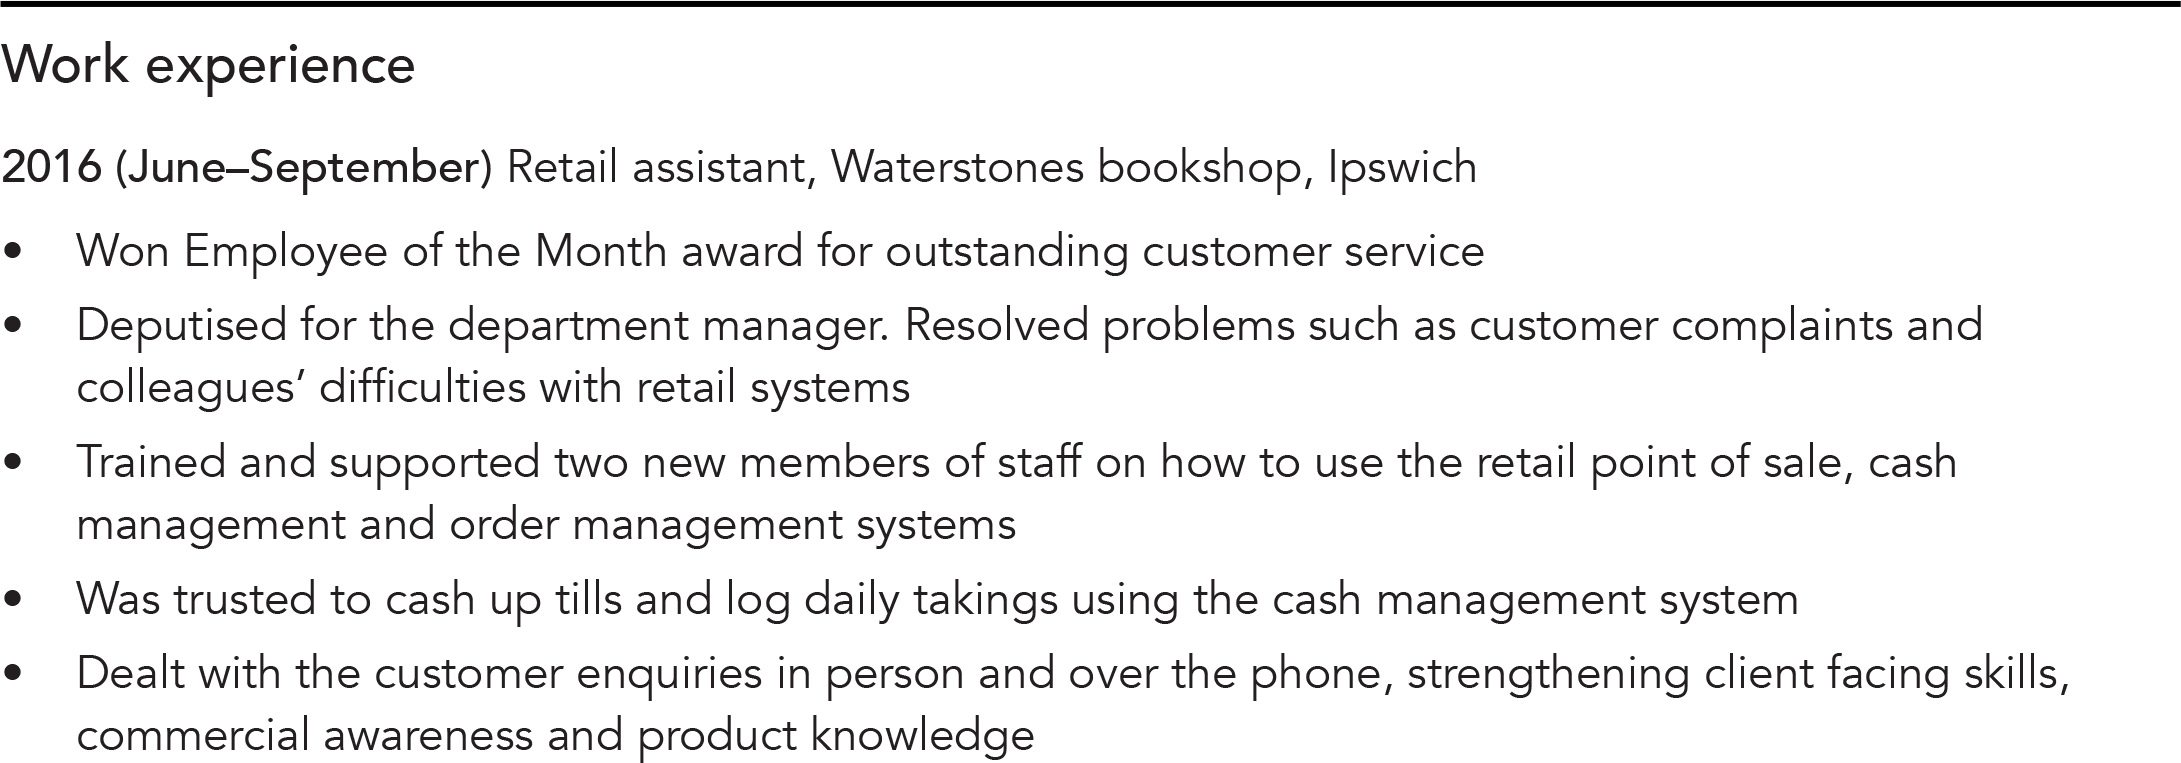 Work experience CV example